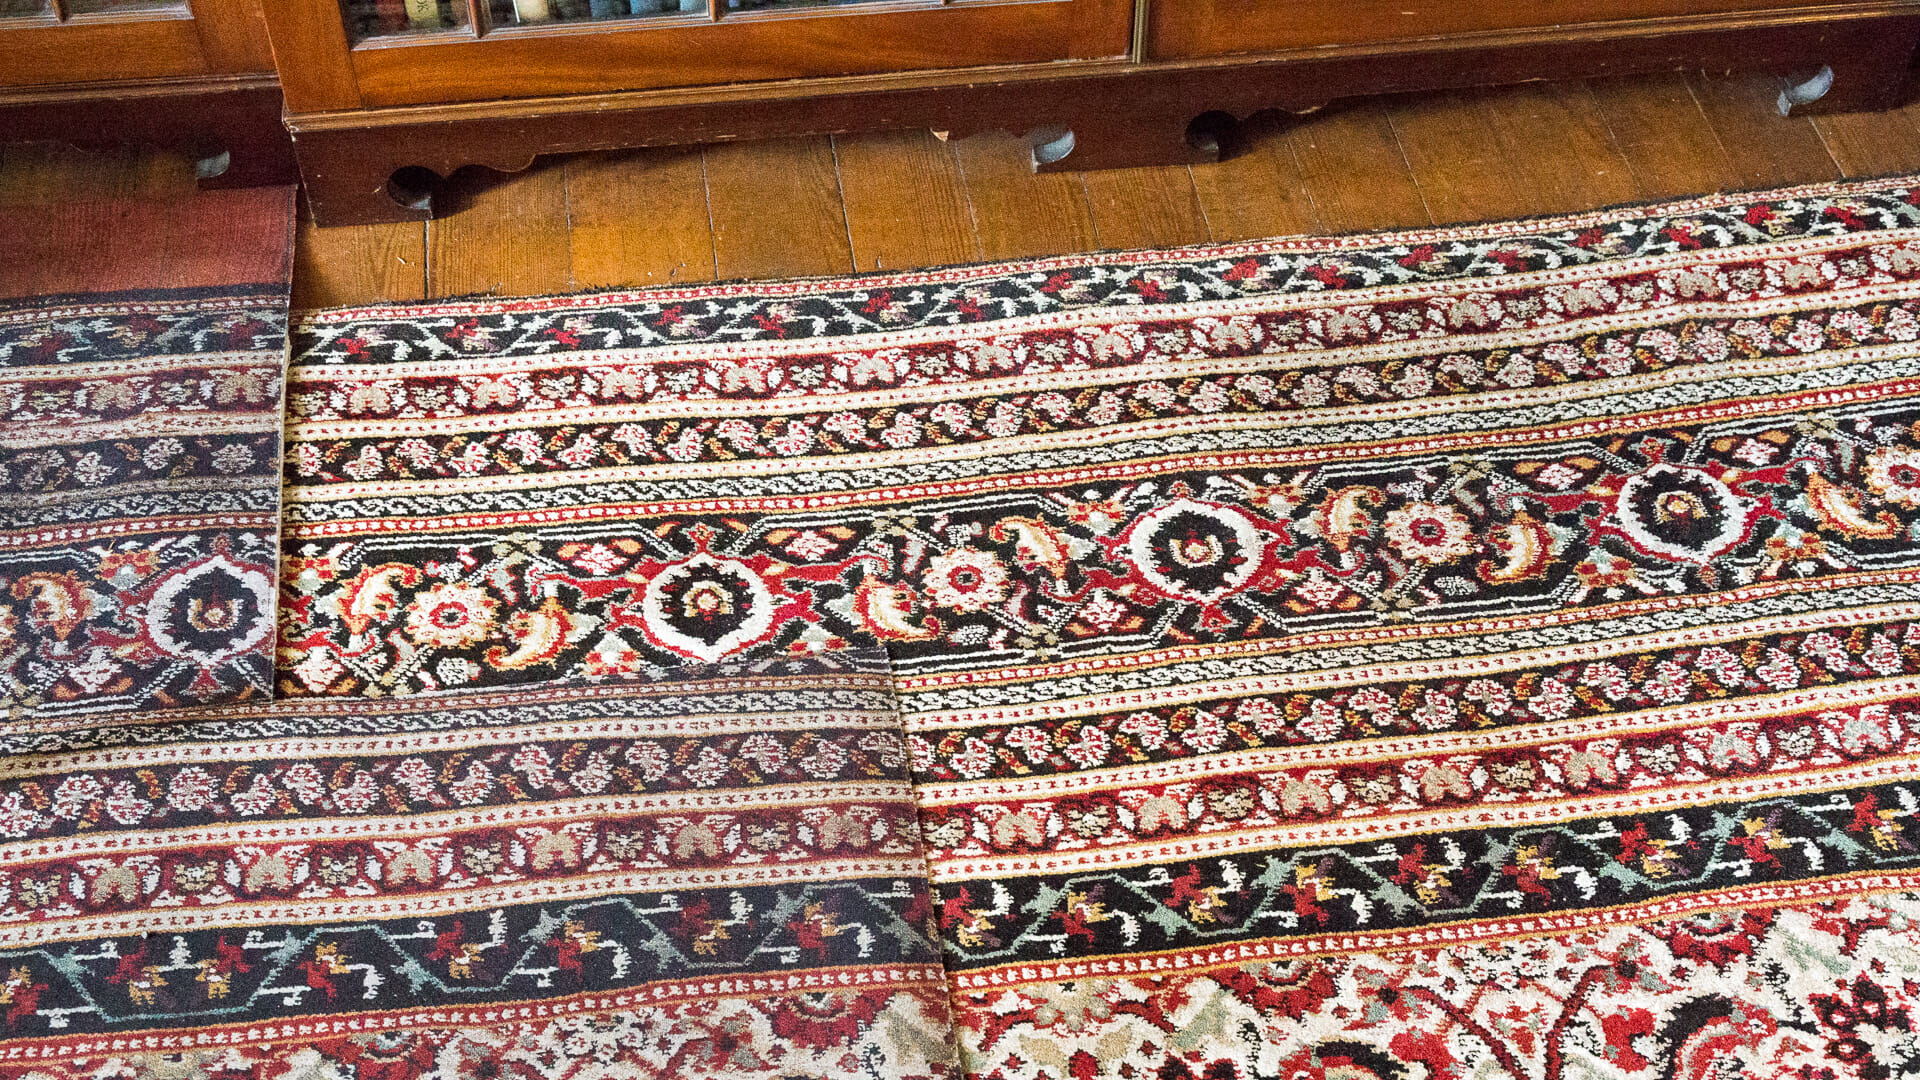 Teppich: Links Nachdruck, rechts Original